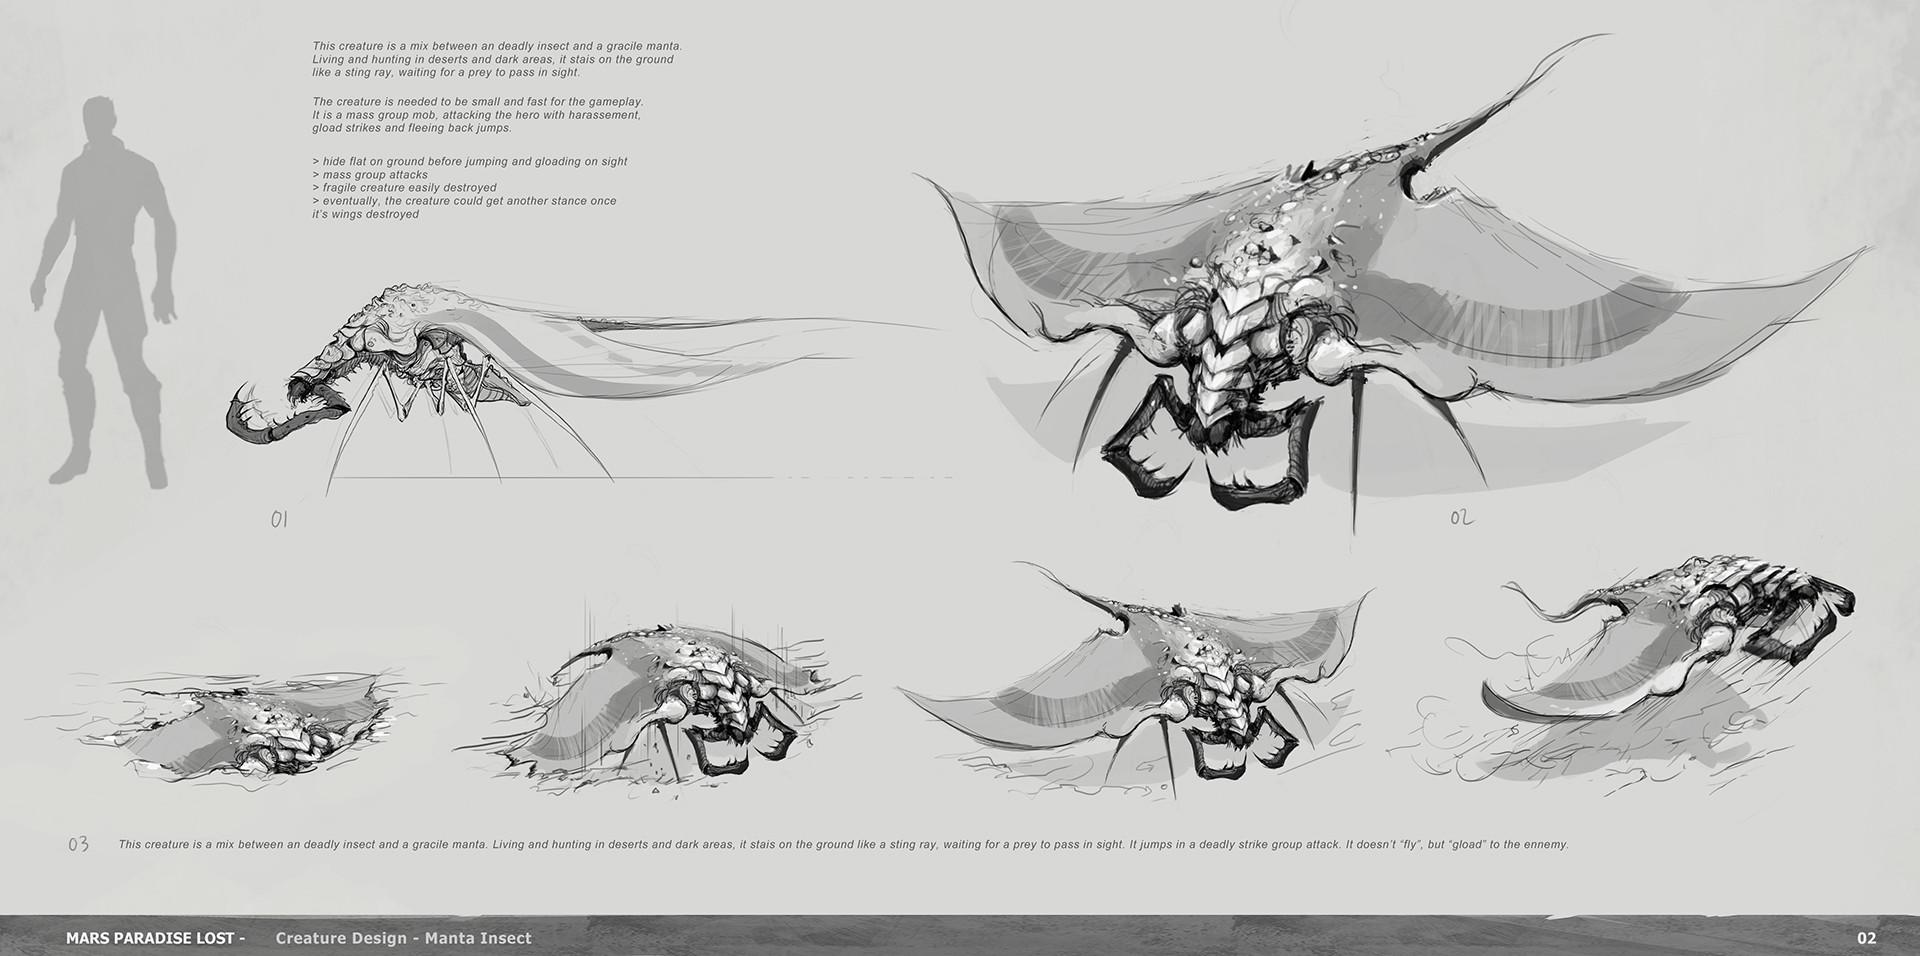 Alexandre chaudret mpl creature manta insect research02